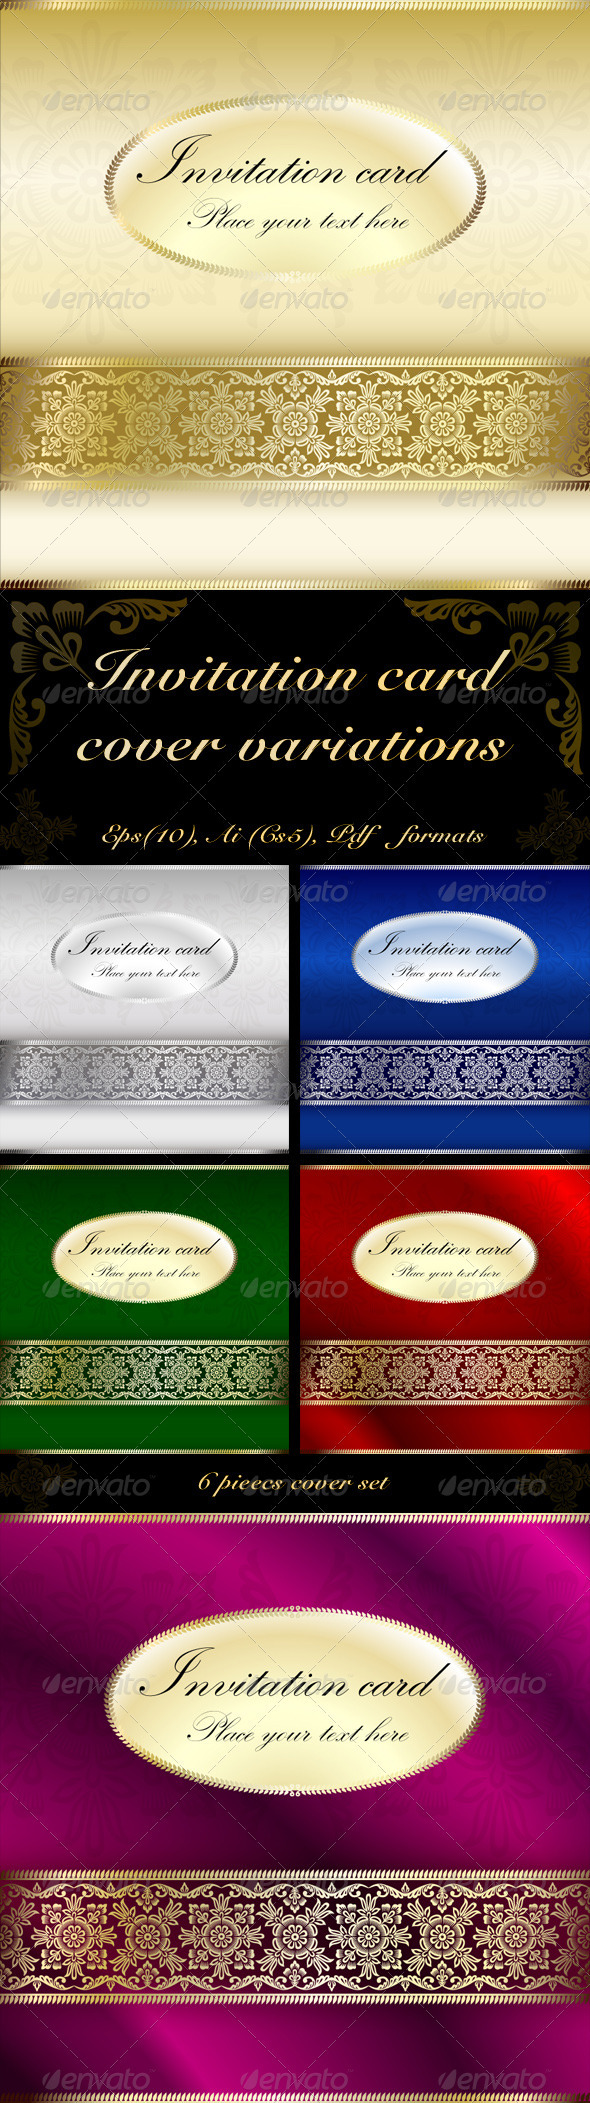 Invitation Card Cover Variations - Seasons/Holidays Conceptual